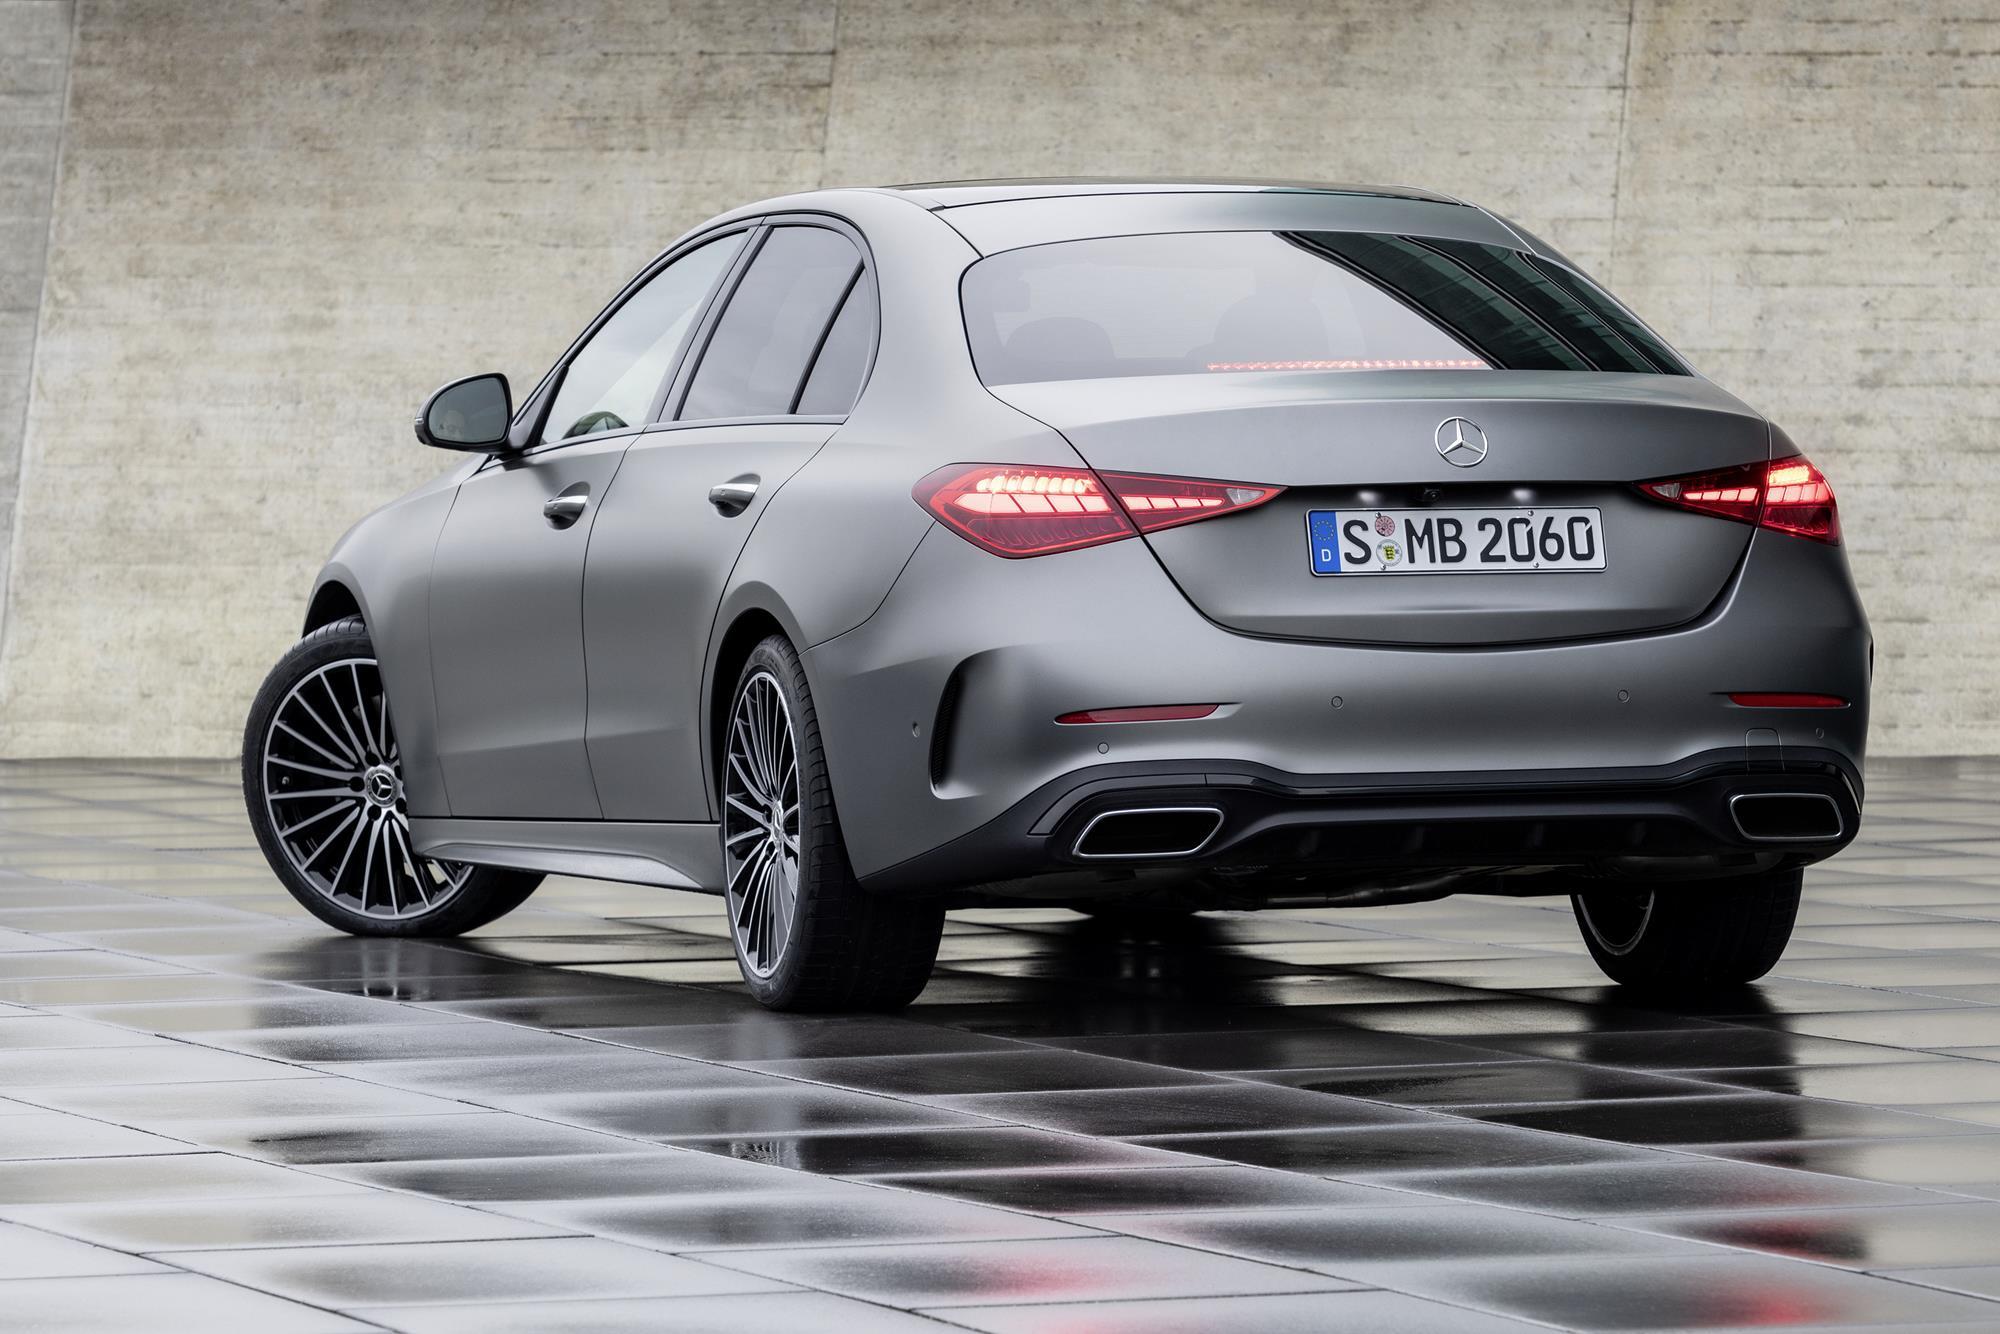 Mercedes-Benz-Classe-C-2022-6.jpg